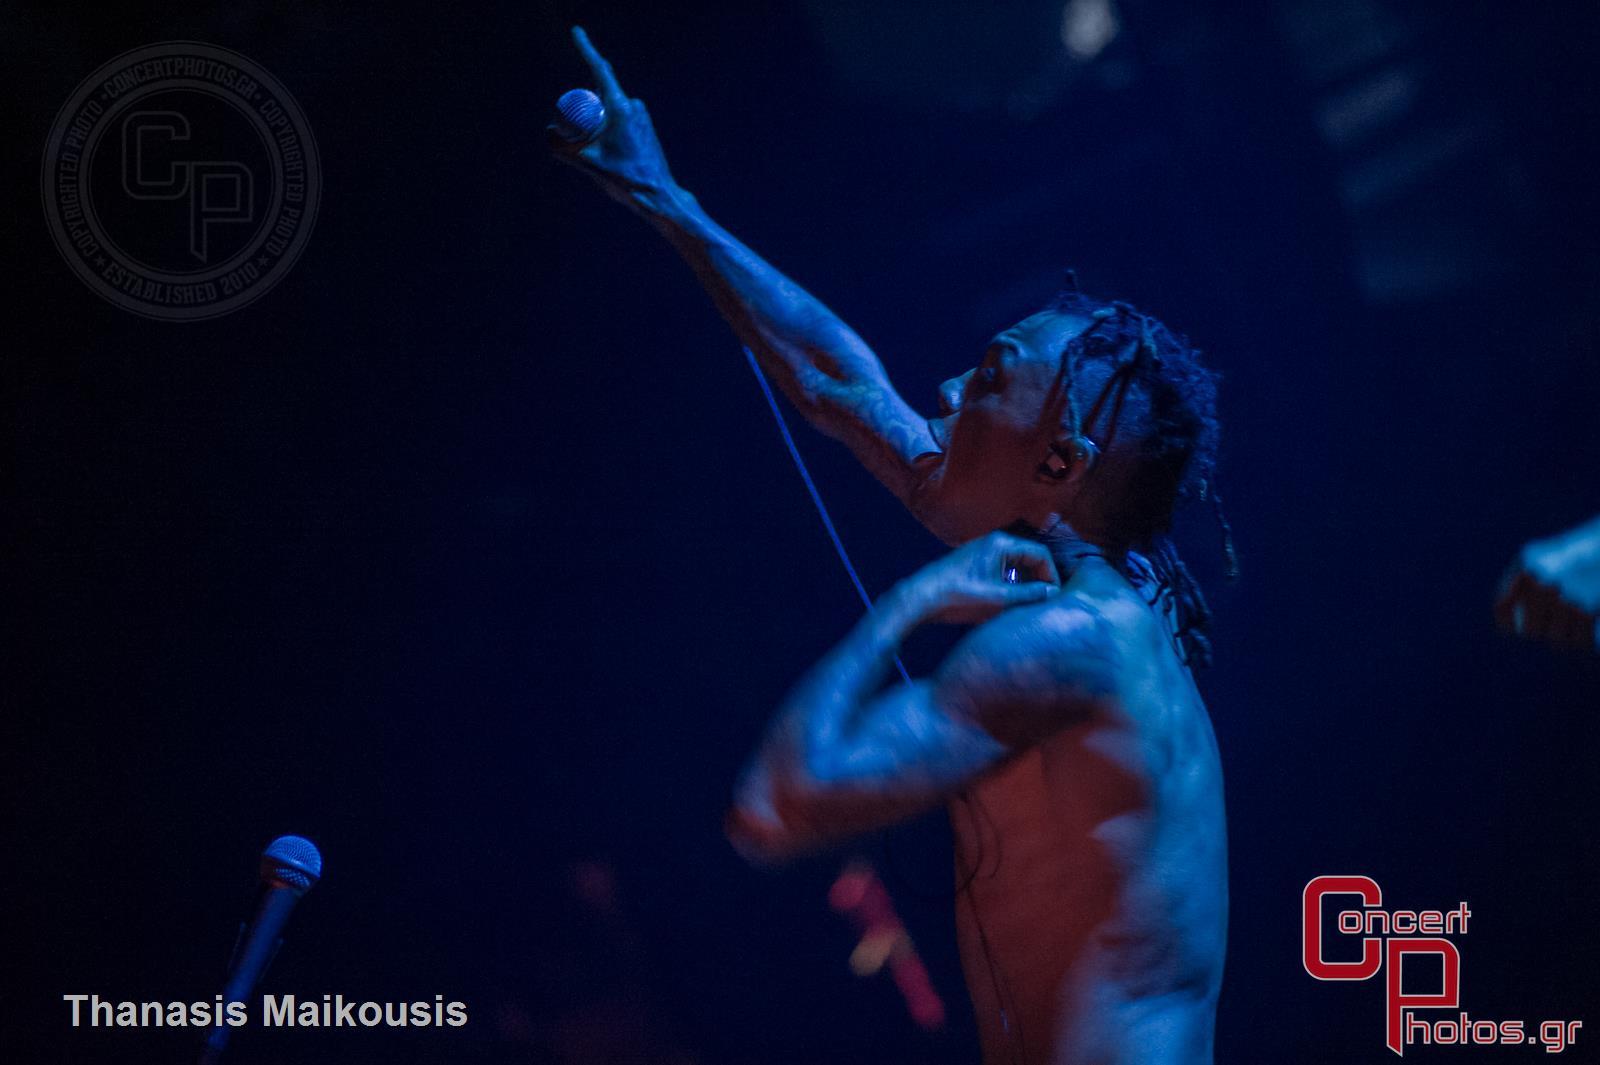 Tricky - Spectralfire-Tricky - Spectralfire photographer: Thanasis Maikousis - concertphotos_-3887